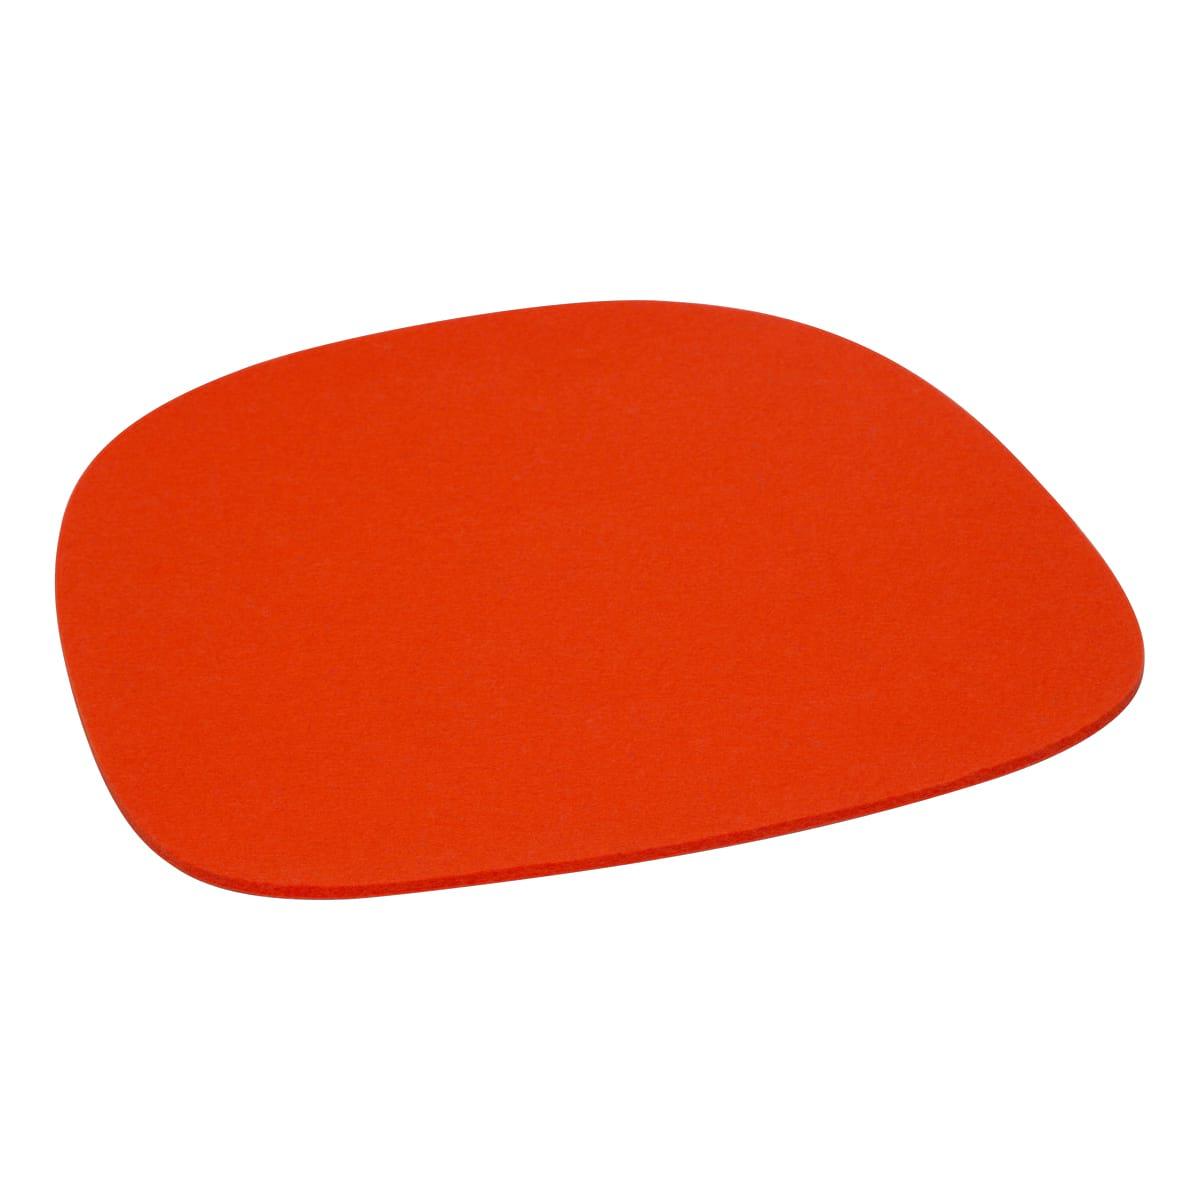 About a Chair Sitzauflage, mango